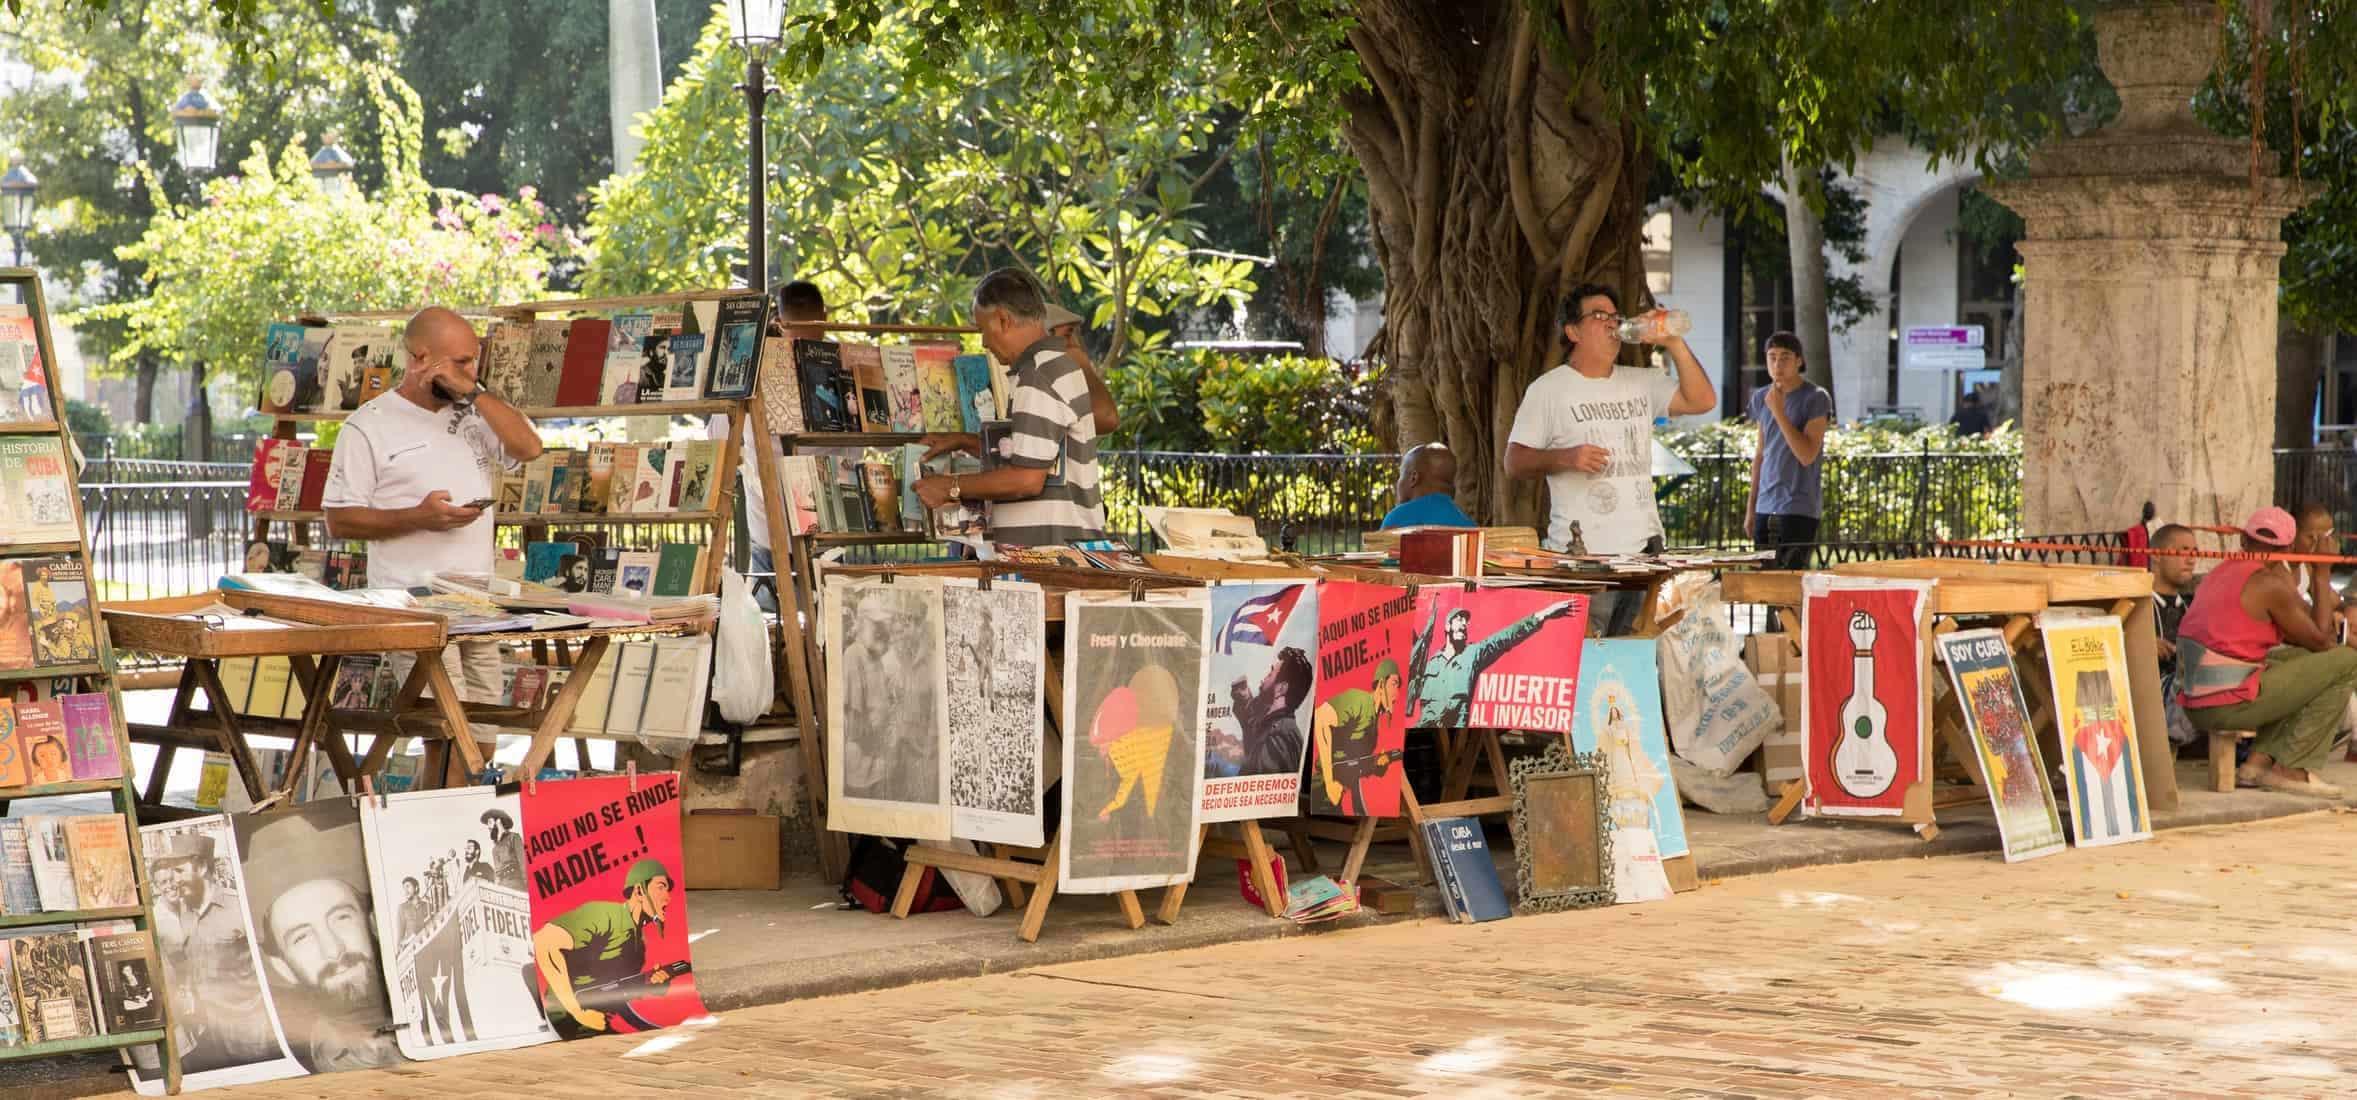 Booksellers near Plaza de la Catedral in Old Havana, Cuba - October 24, 2016